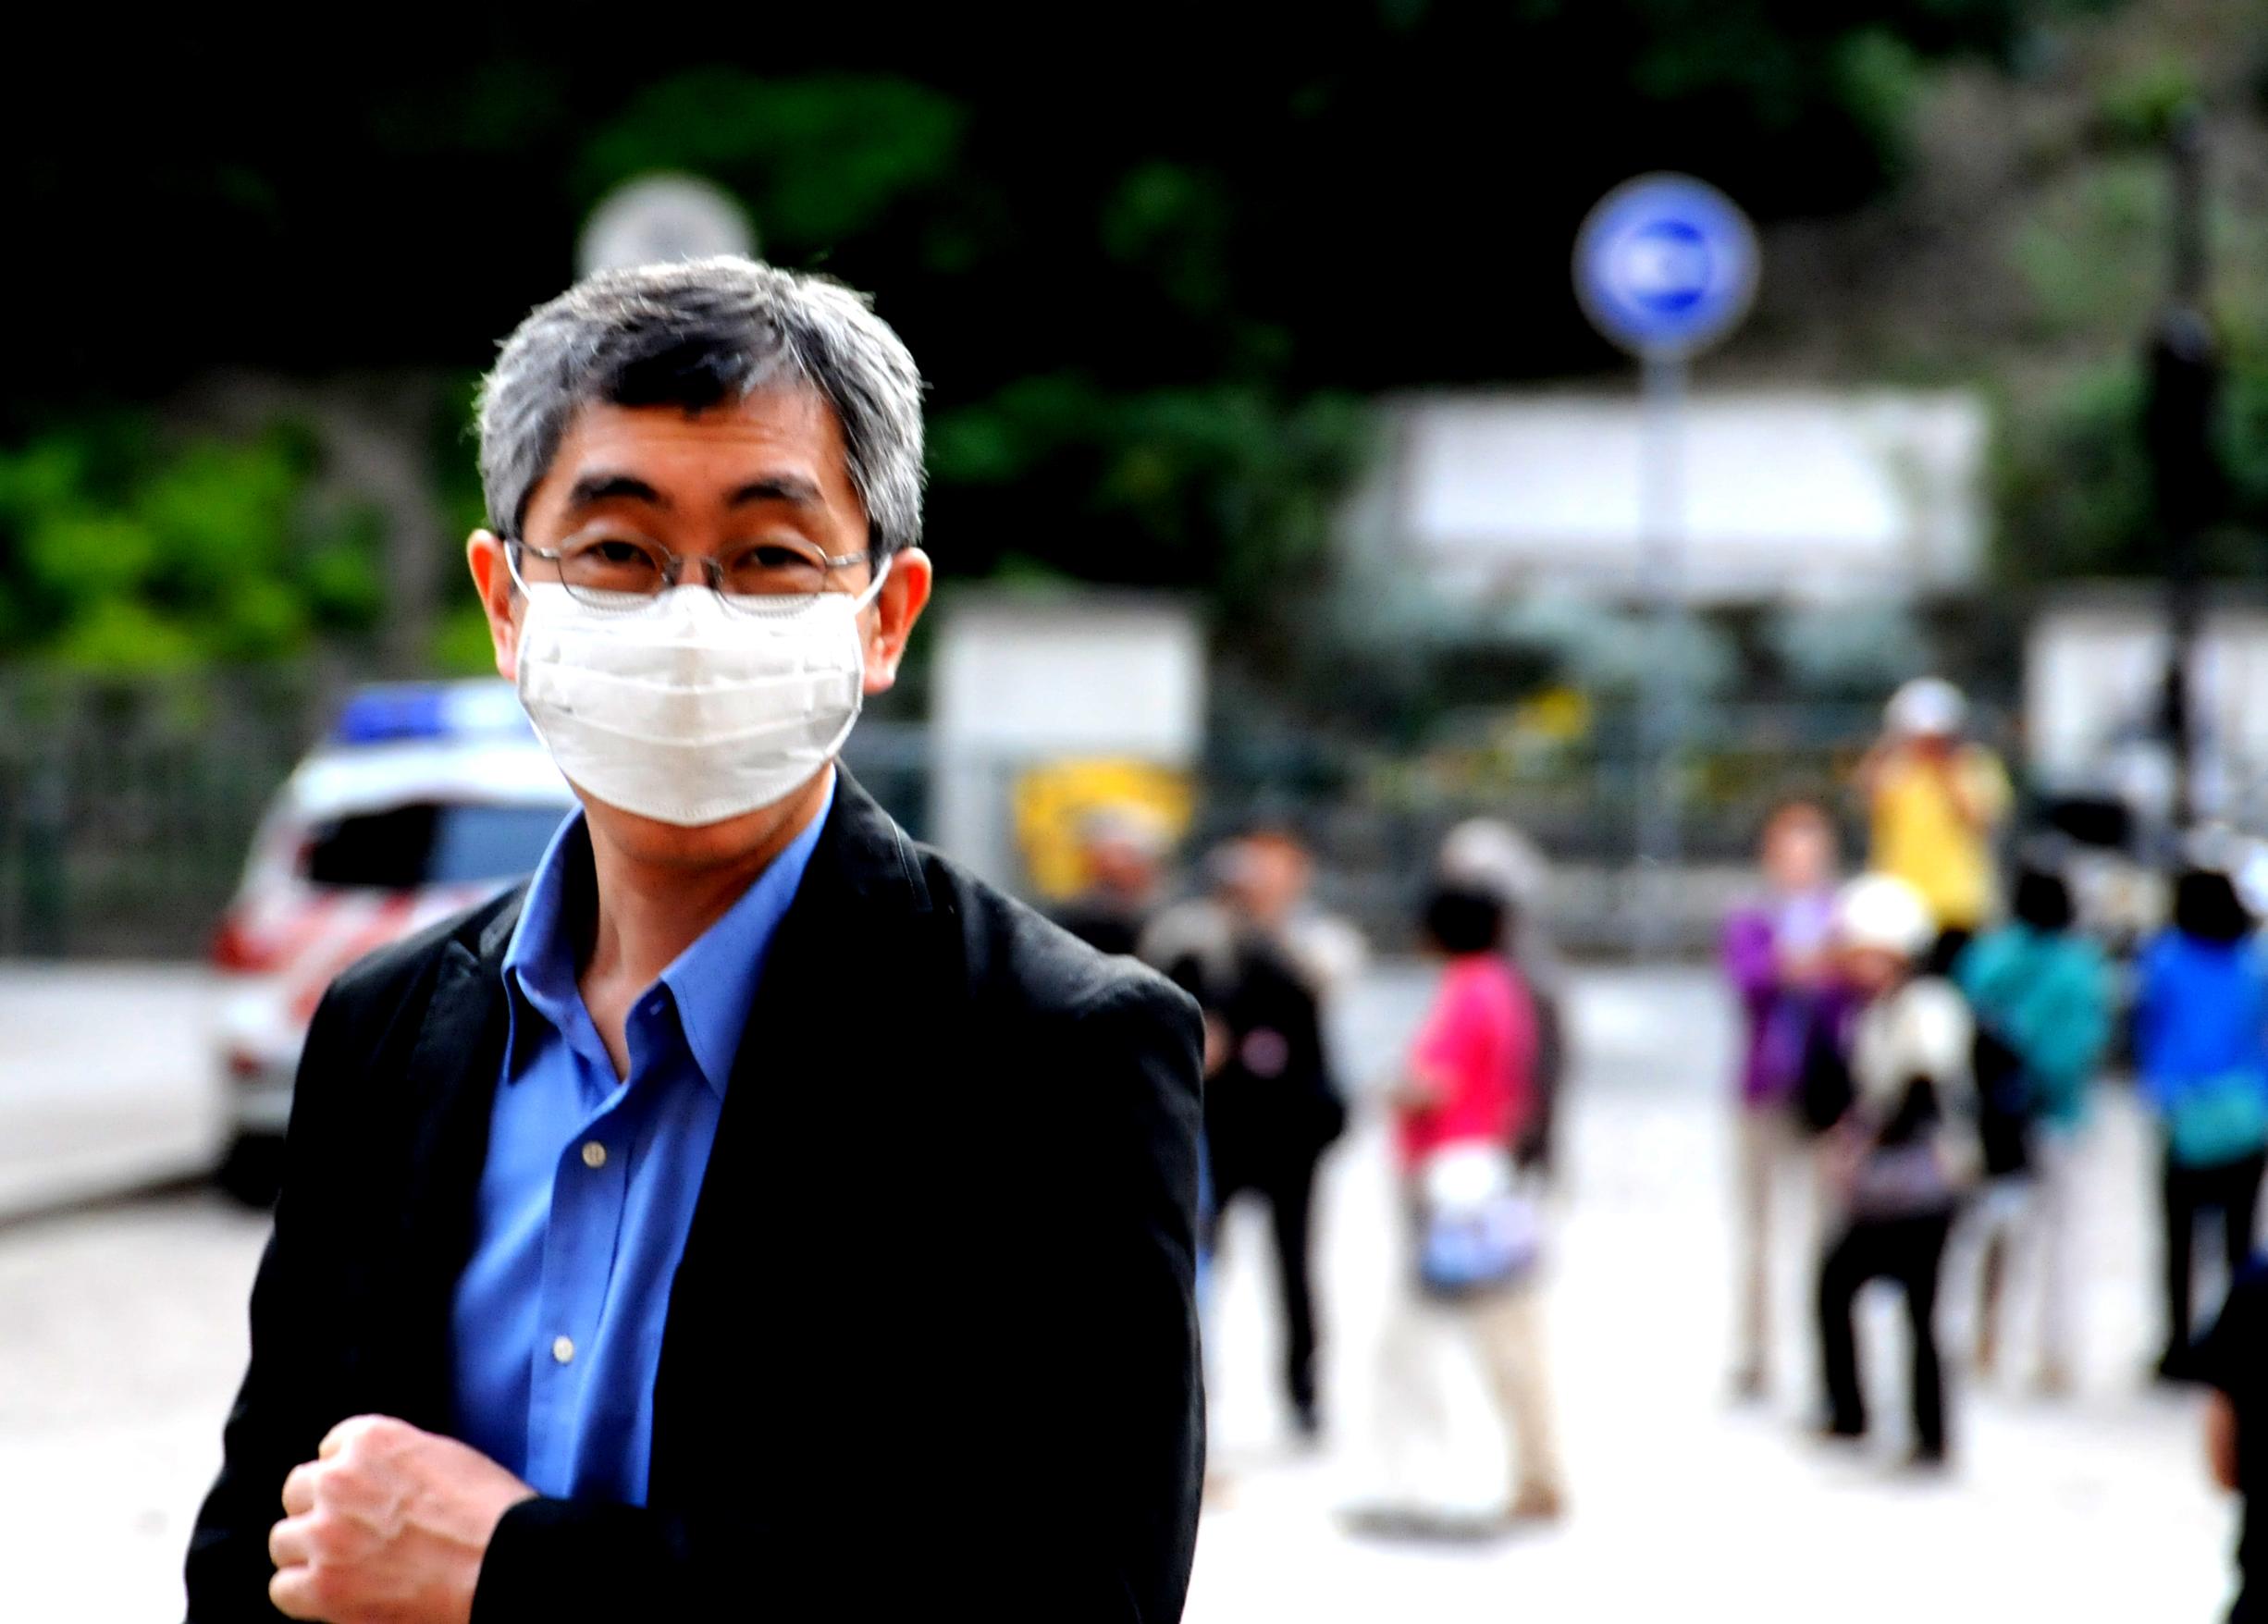 preventing spread of disease